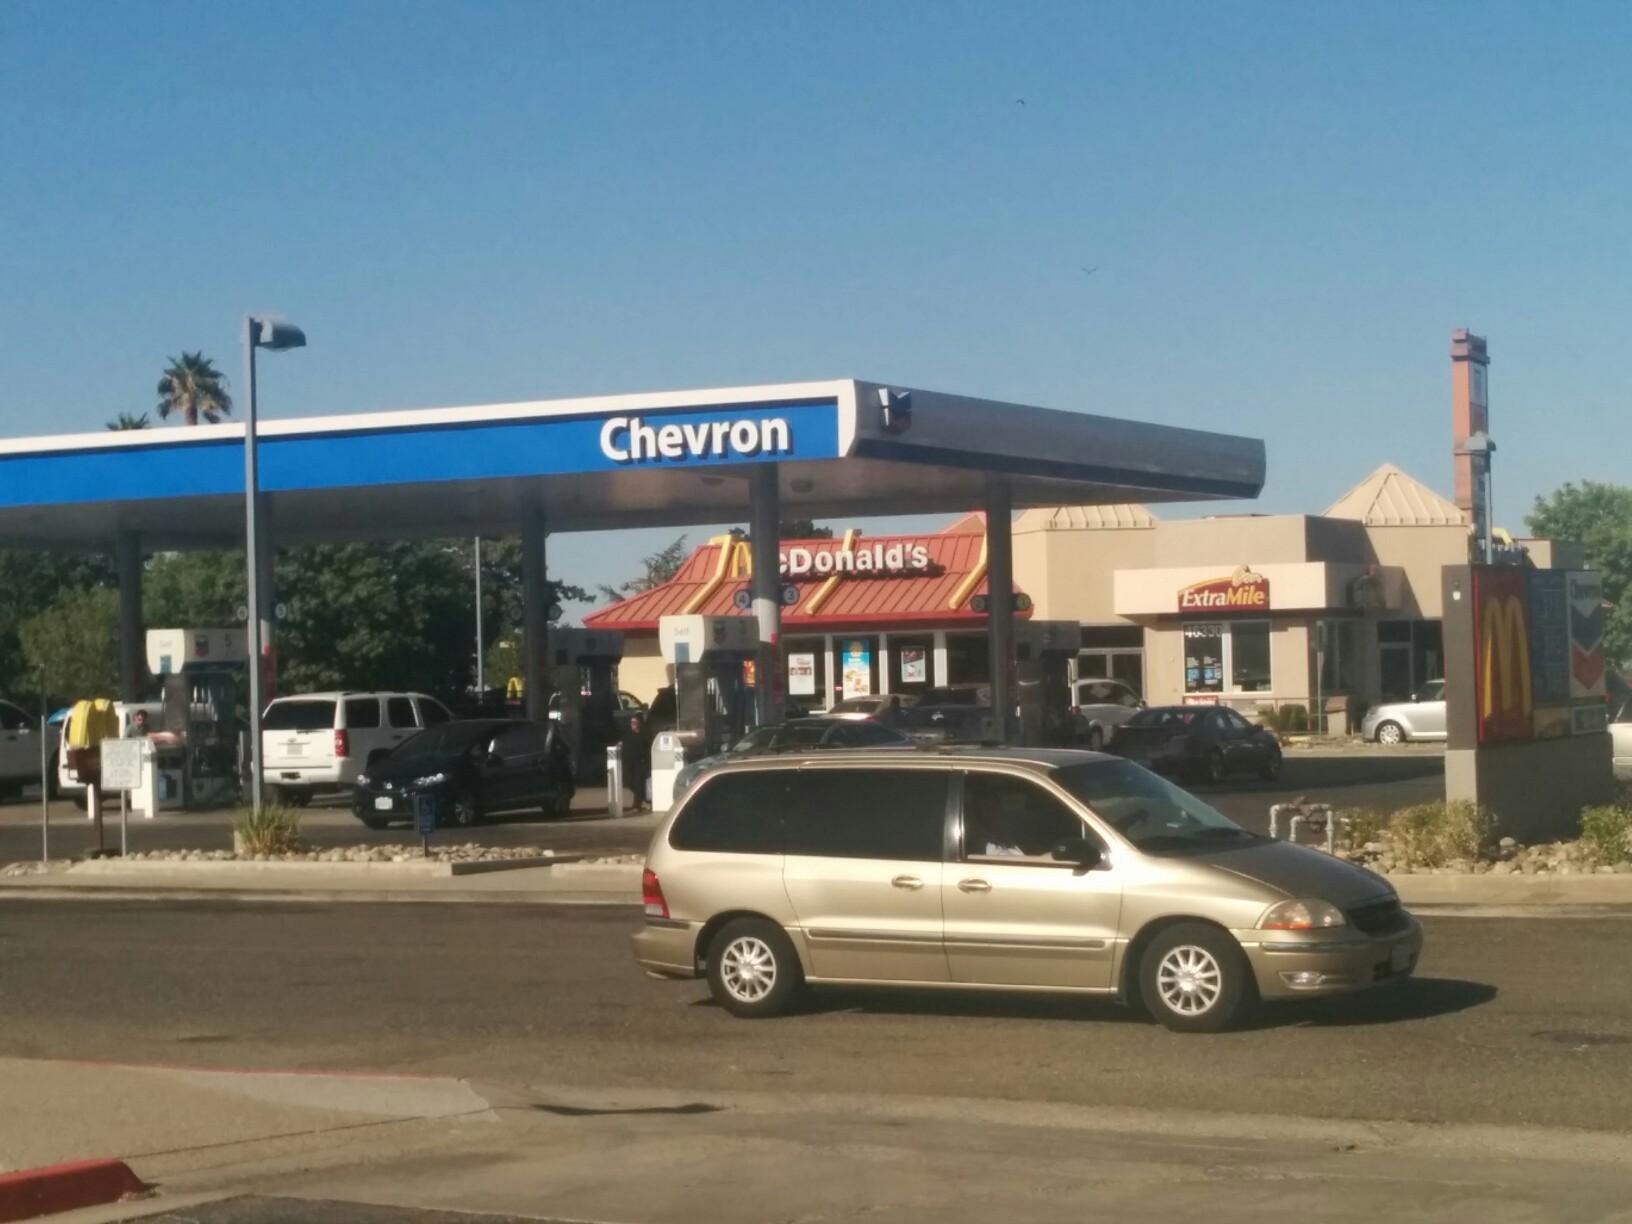 Chevron 46330 W Panoche Rd, Firebaugh, CA 93622 - YP.com